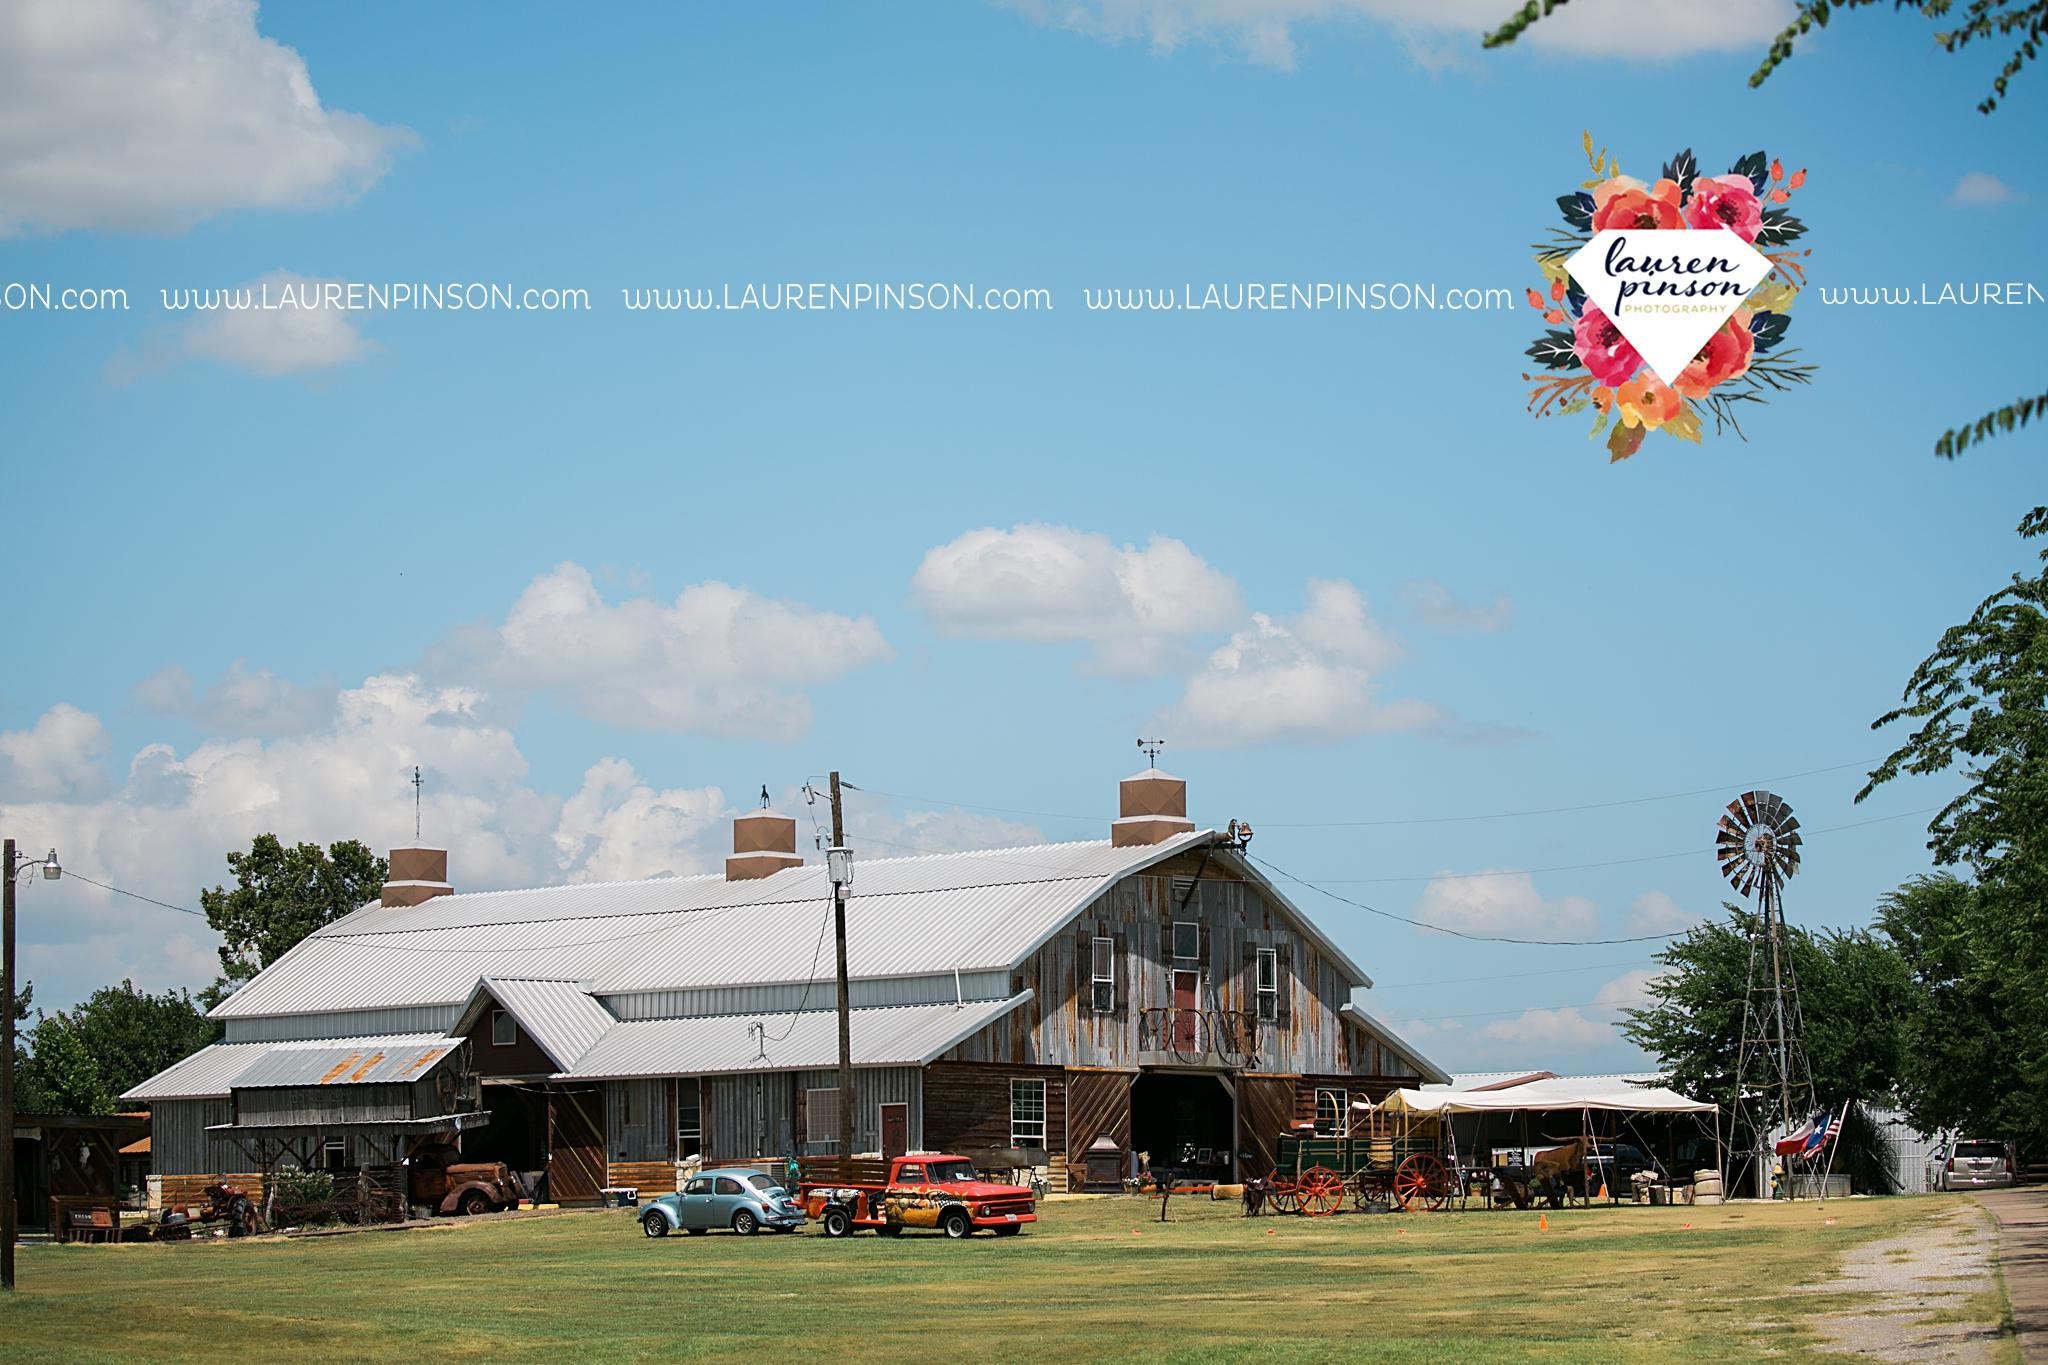 jones-barn-willow-creek-ranch-wedding-in-cleburne-texas-fort-worth-dfw-wichita-falls-wedding-photography_3183.jpg